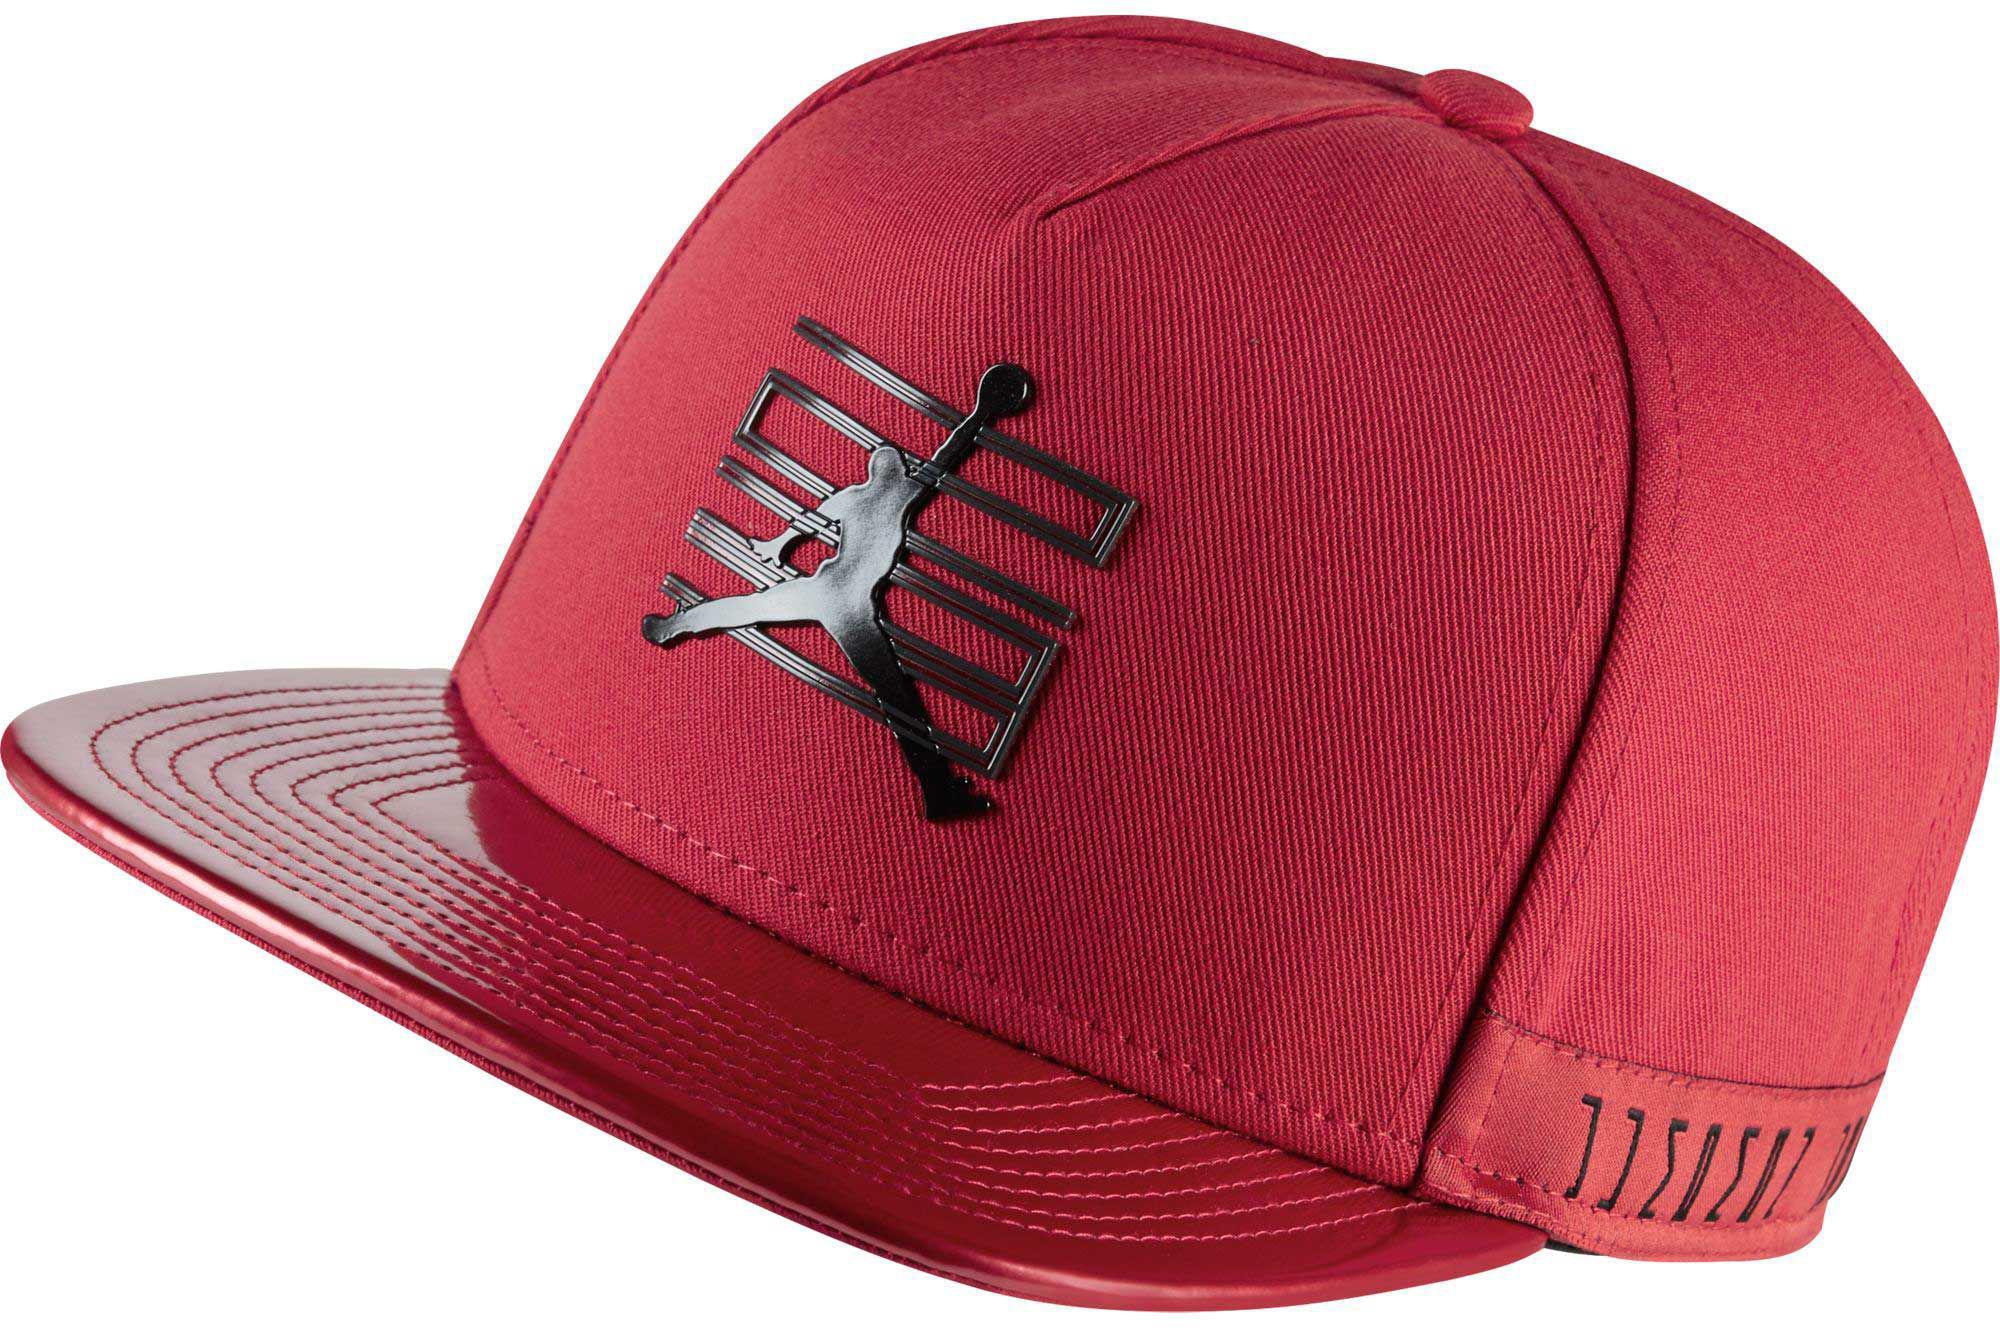 49a40305a9d Lyst - Nike Jordan 11 Snapback Hat in Red for Men